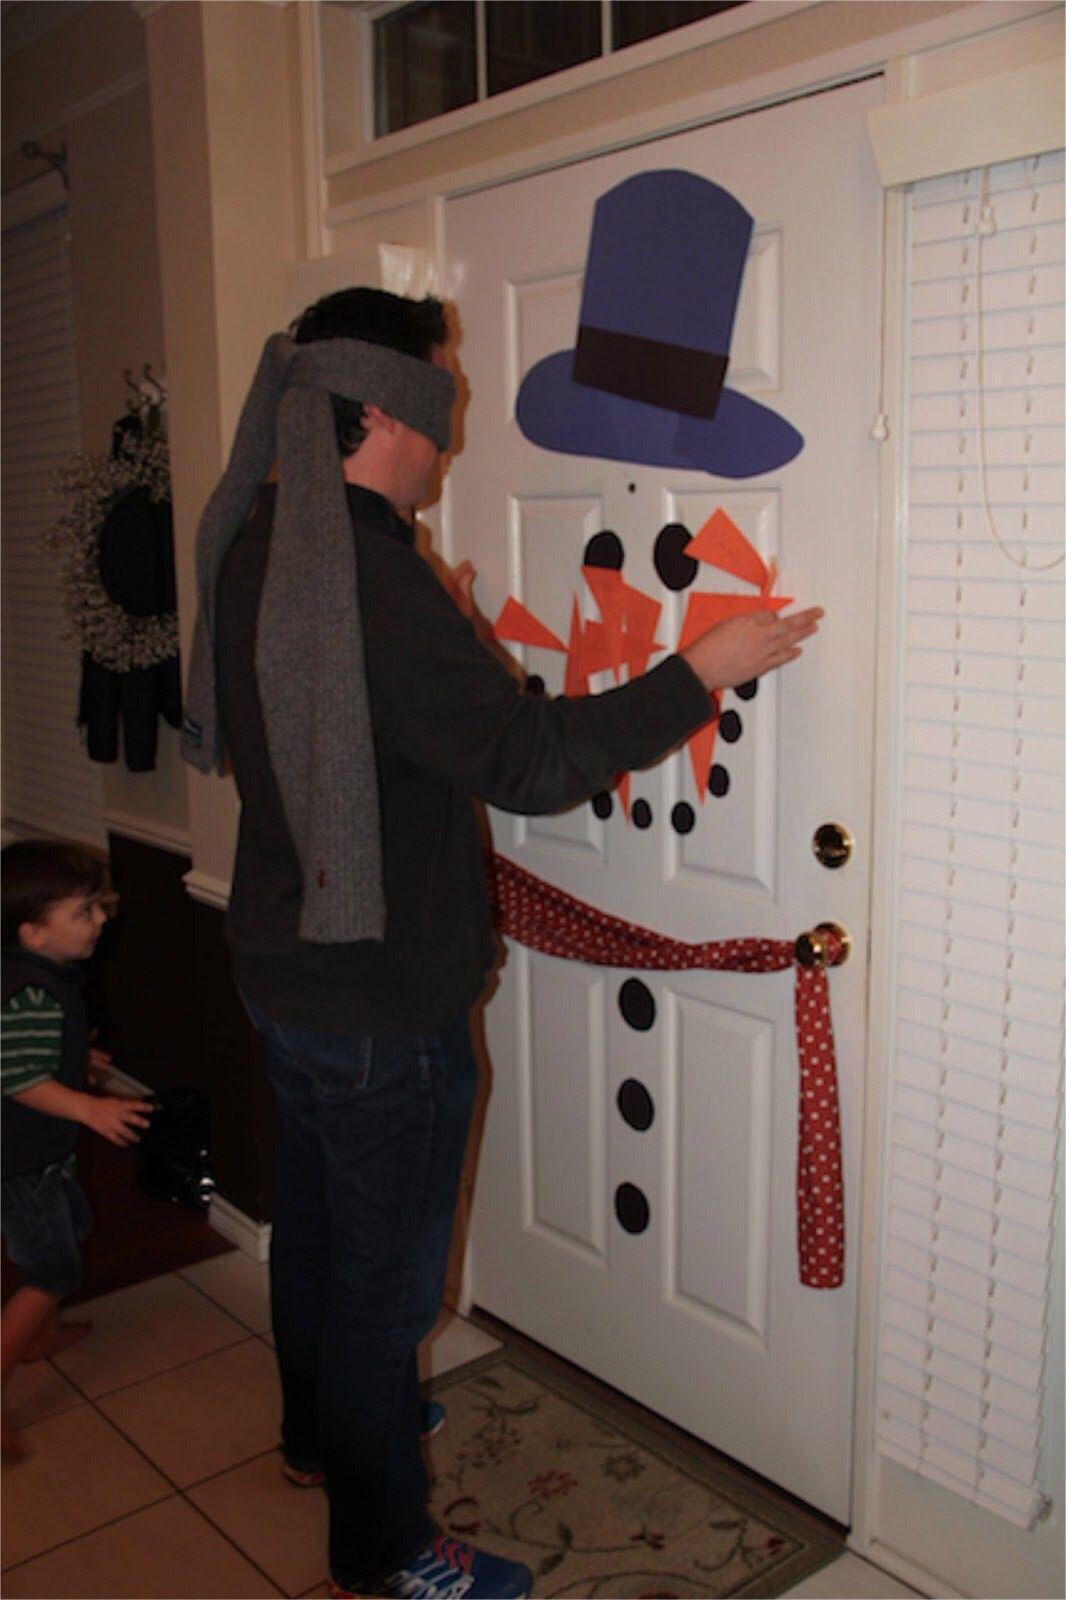 Pin the nose on a snowman | Party Ideas | Pinterest | Snowman ...